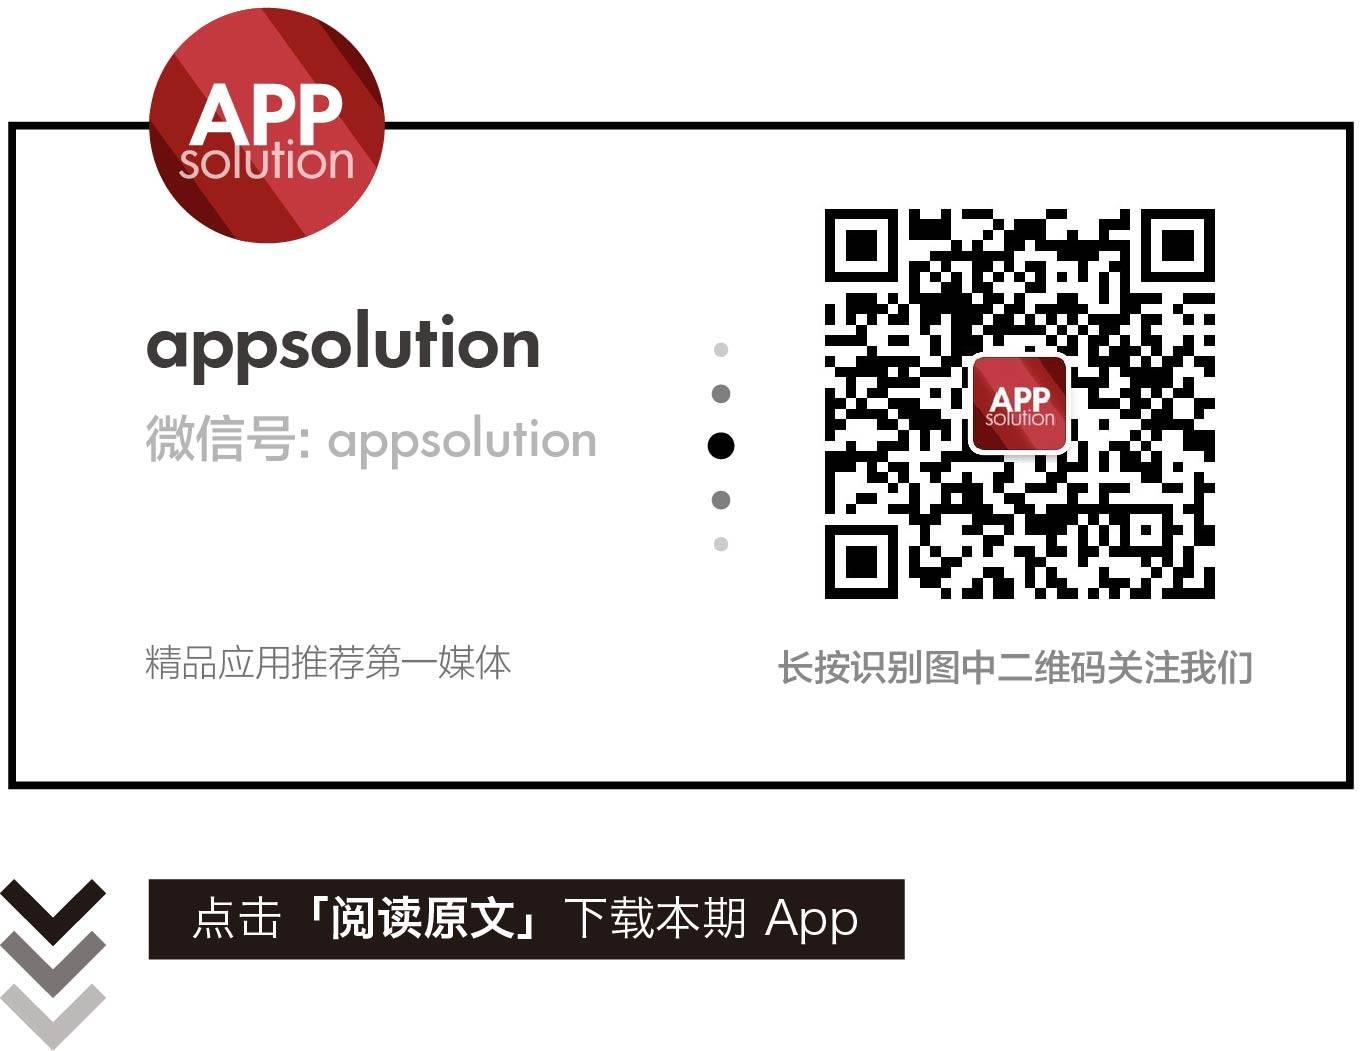 appso-banner